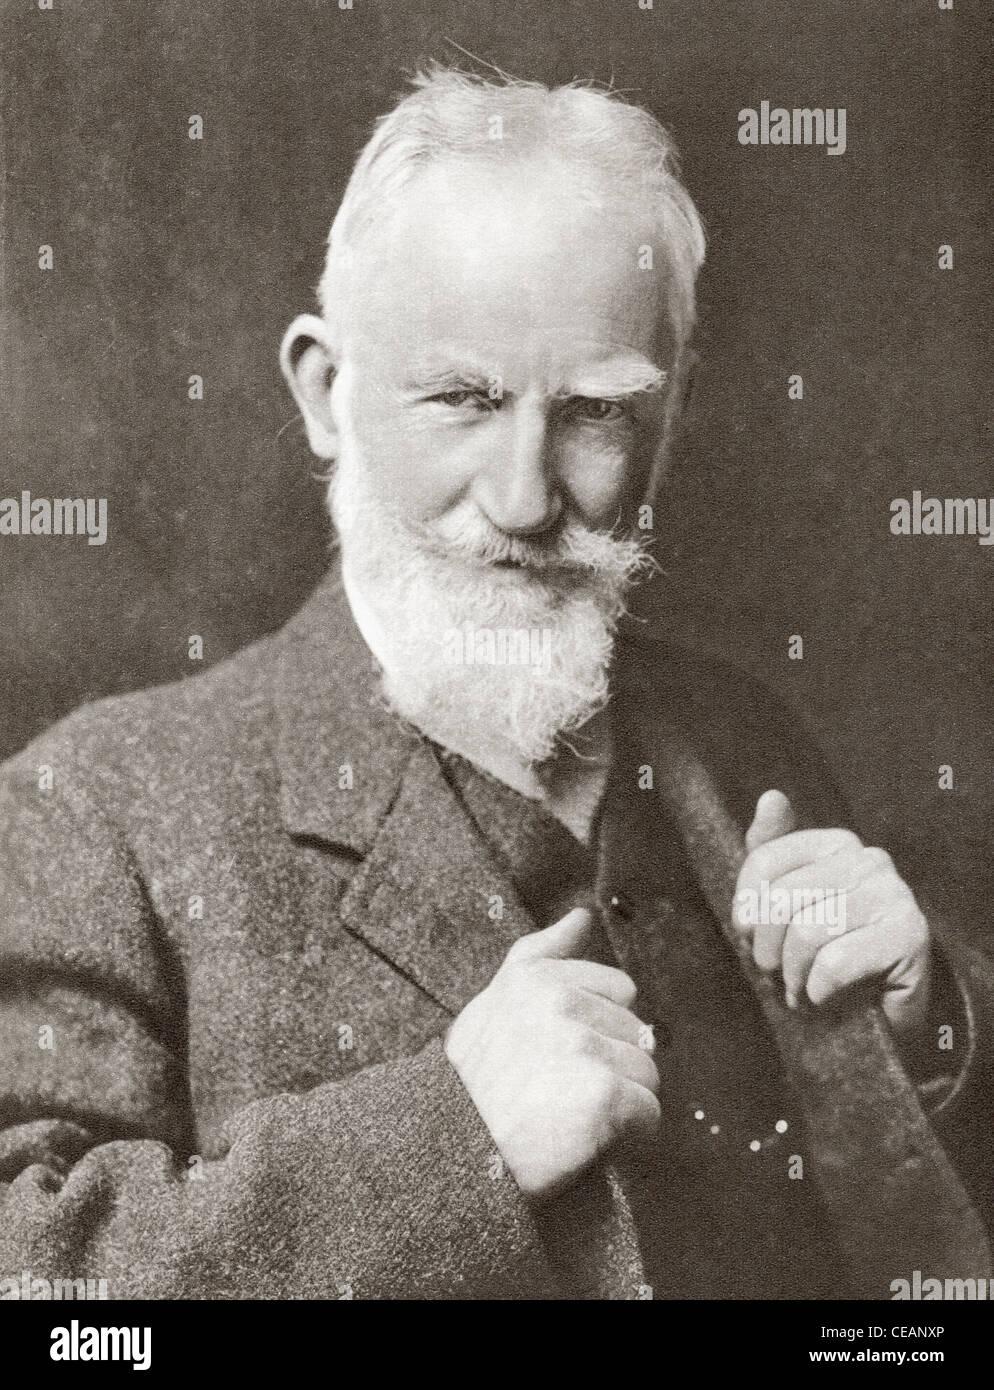 George Bernard Shaw, 1856 – 1950. Irish playwright, critic, political activist and Nobel Prizewinner. - Stock Image